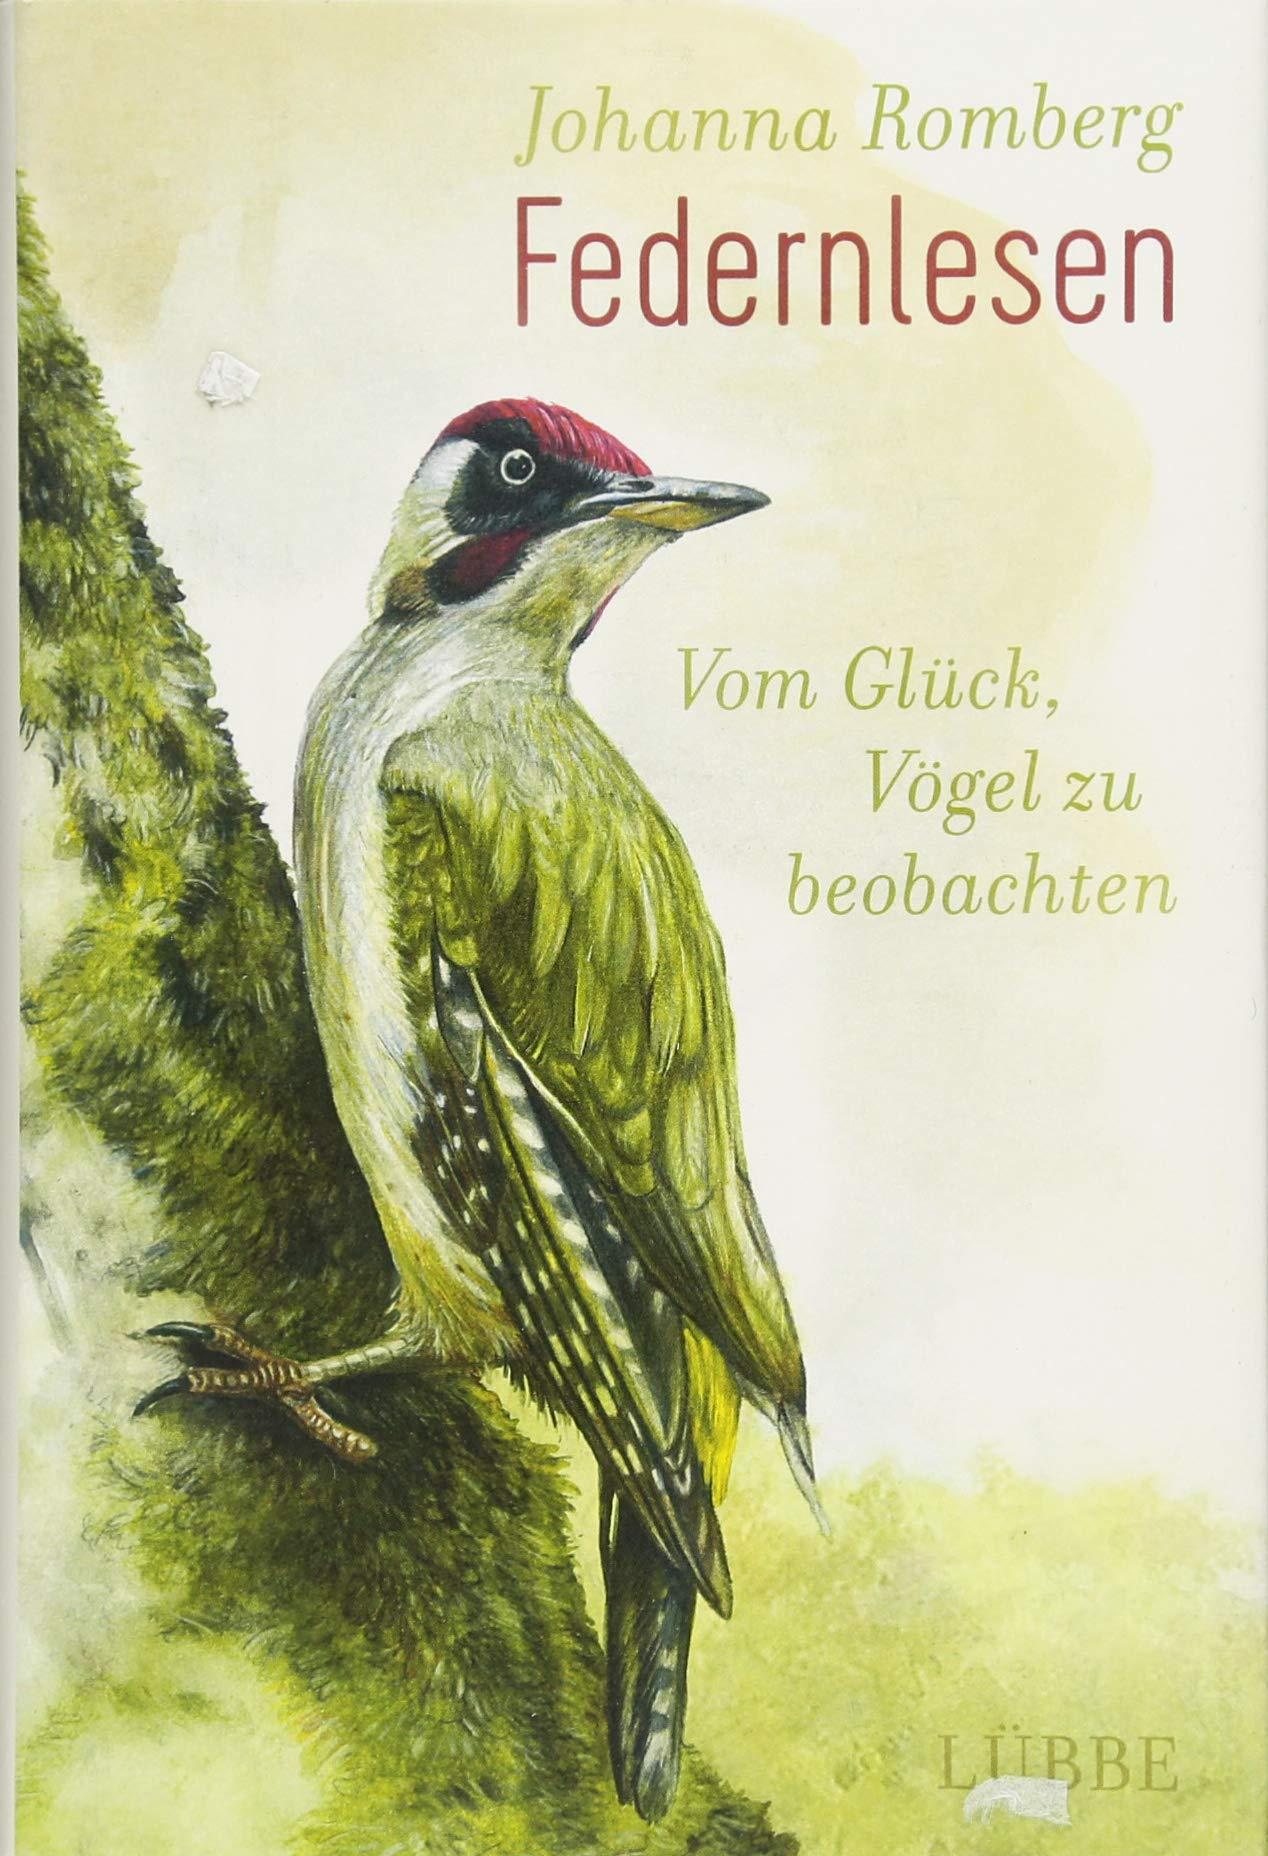 Federnlesen: Vom Glück, Vögel zu beobachten Gebundenes Buch – 23. Februar 2018 Johanna Romberg Florian Frick Federnlesen: Vom Glück Vögel zu beobachten